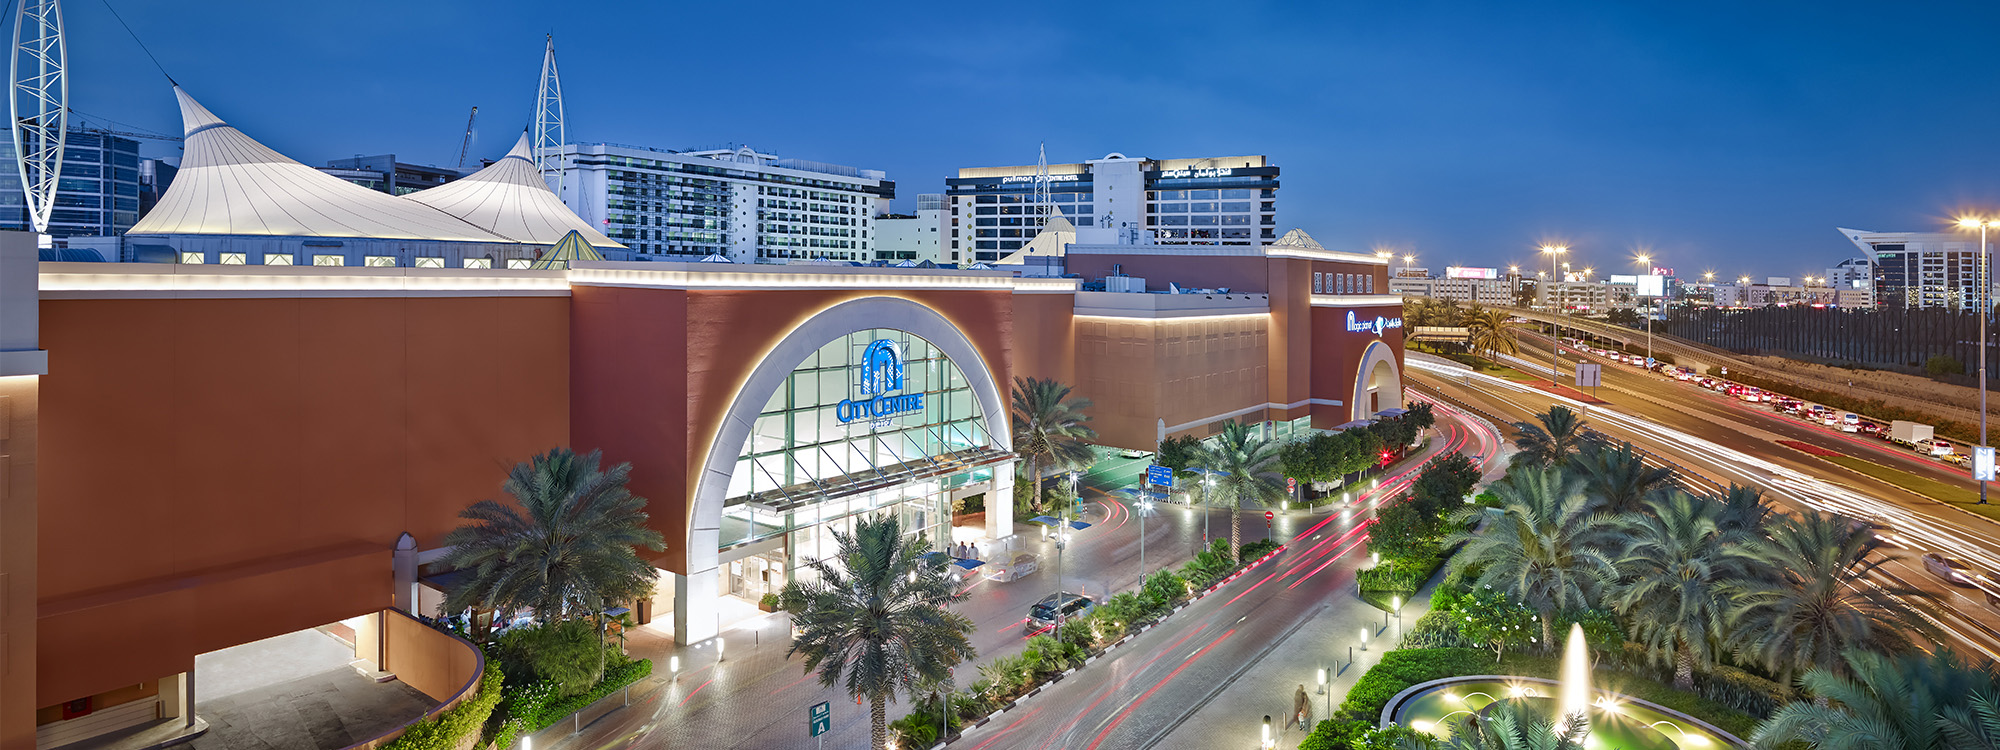 Enjoy Shopping Magic Planet Cinemas City Centre Deira